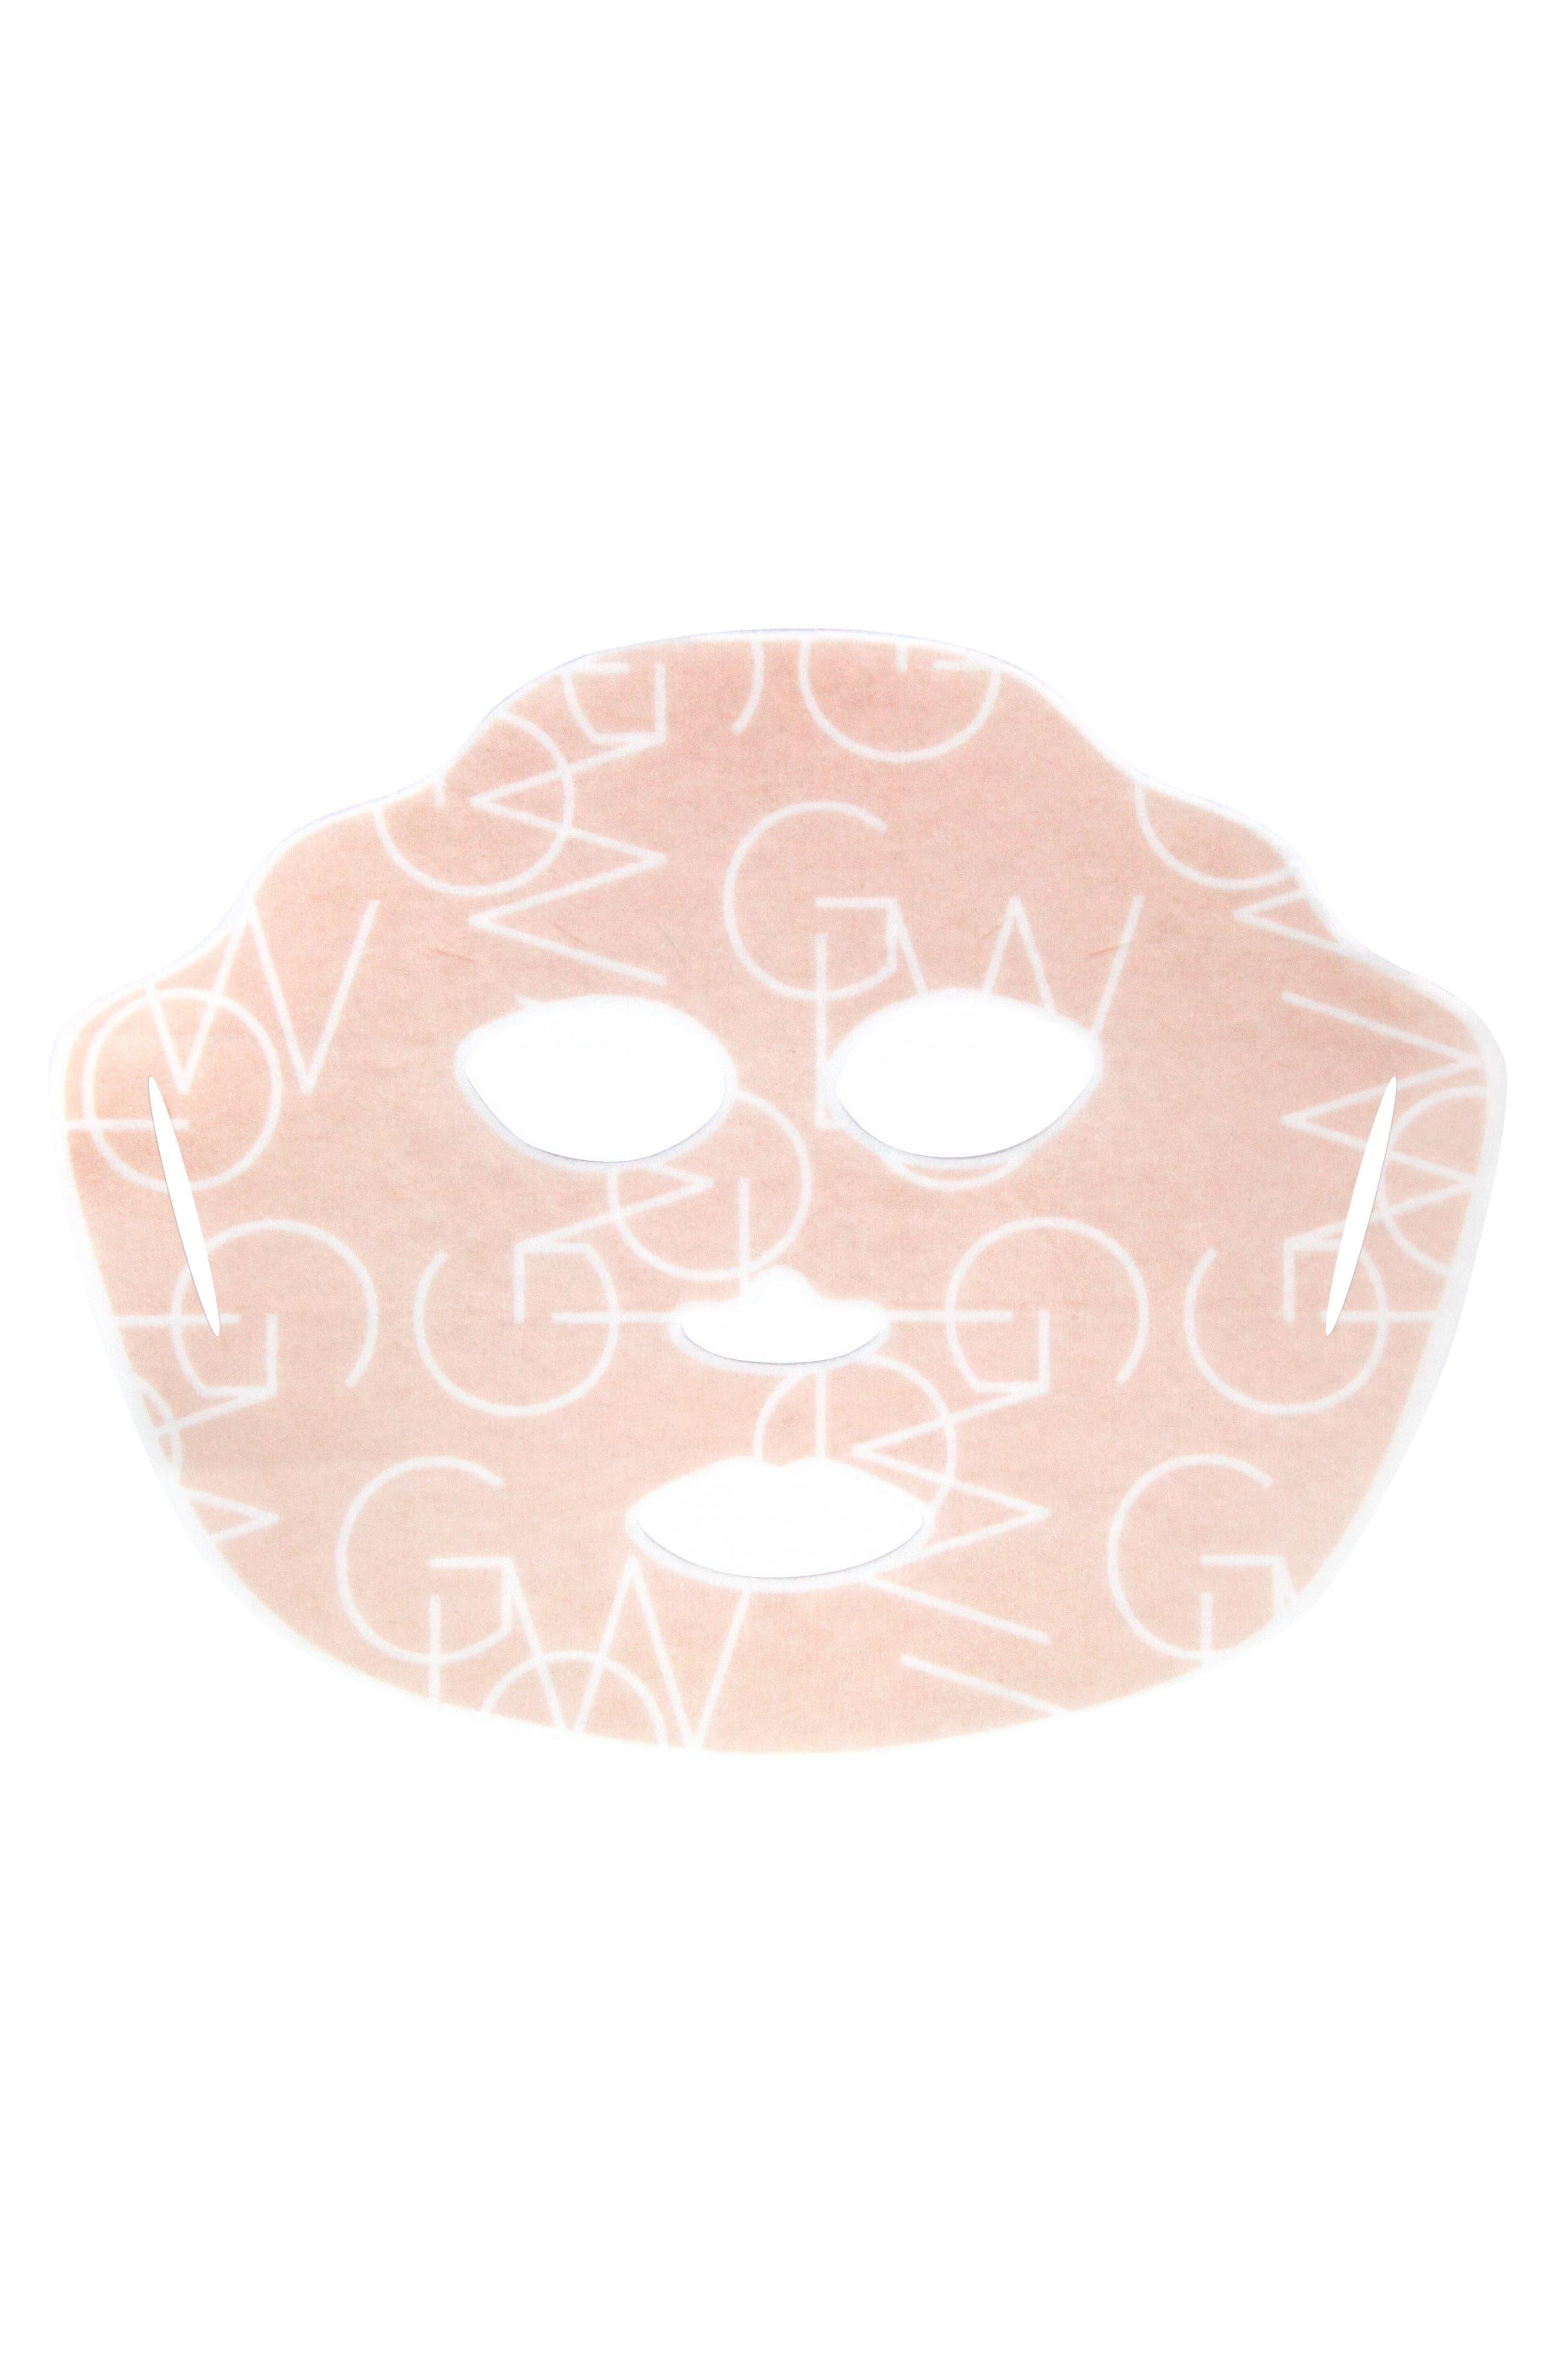 DRY Mask SelfieFix Waterless Facial Mask,                             Alternate thumbnail 2, color,                             NO COLOR